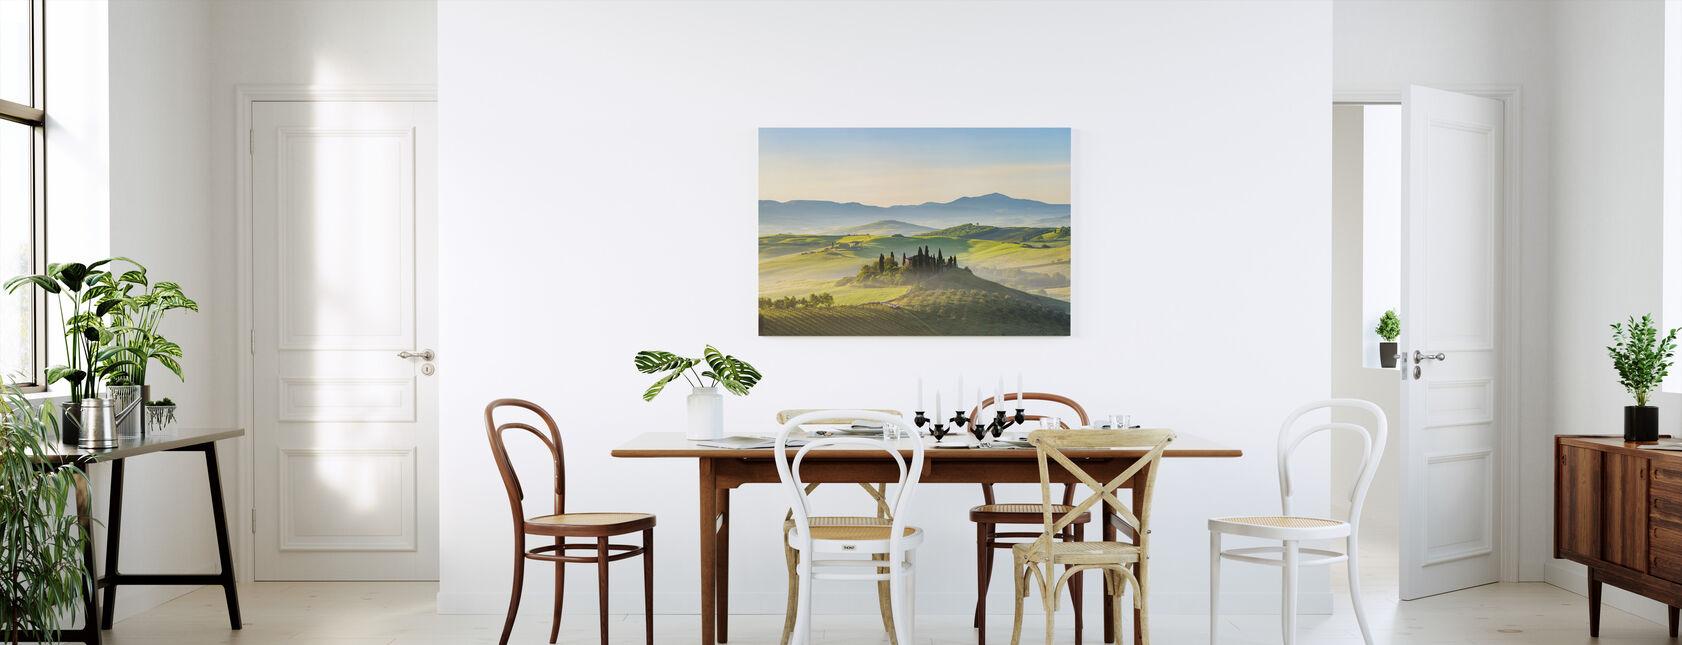 Toscane in de lente ochtend - Canvas print - Keuken